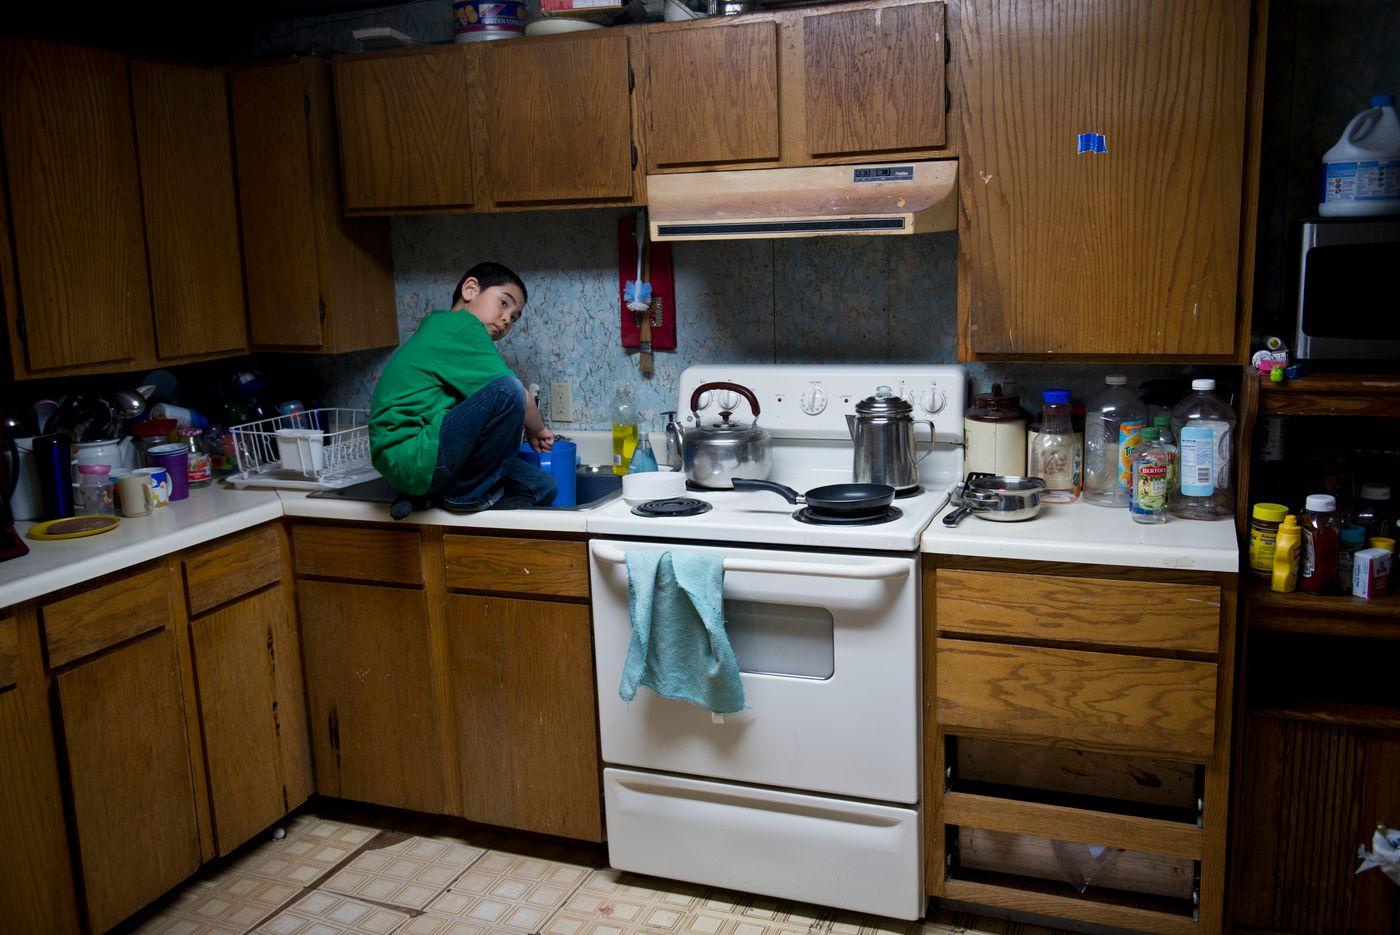 Lucas Penayah, 7, makes juice in Harriet Penayah's home in Savoonga. (Marc Lester / Alaska Dispatch News)